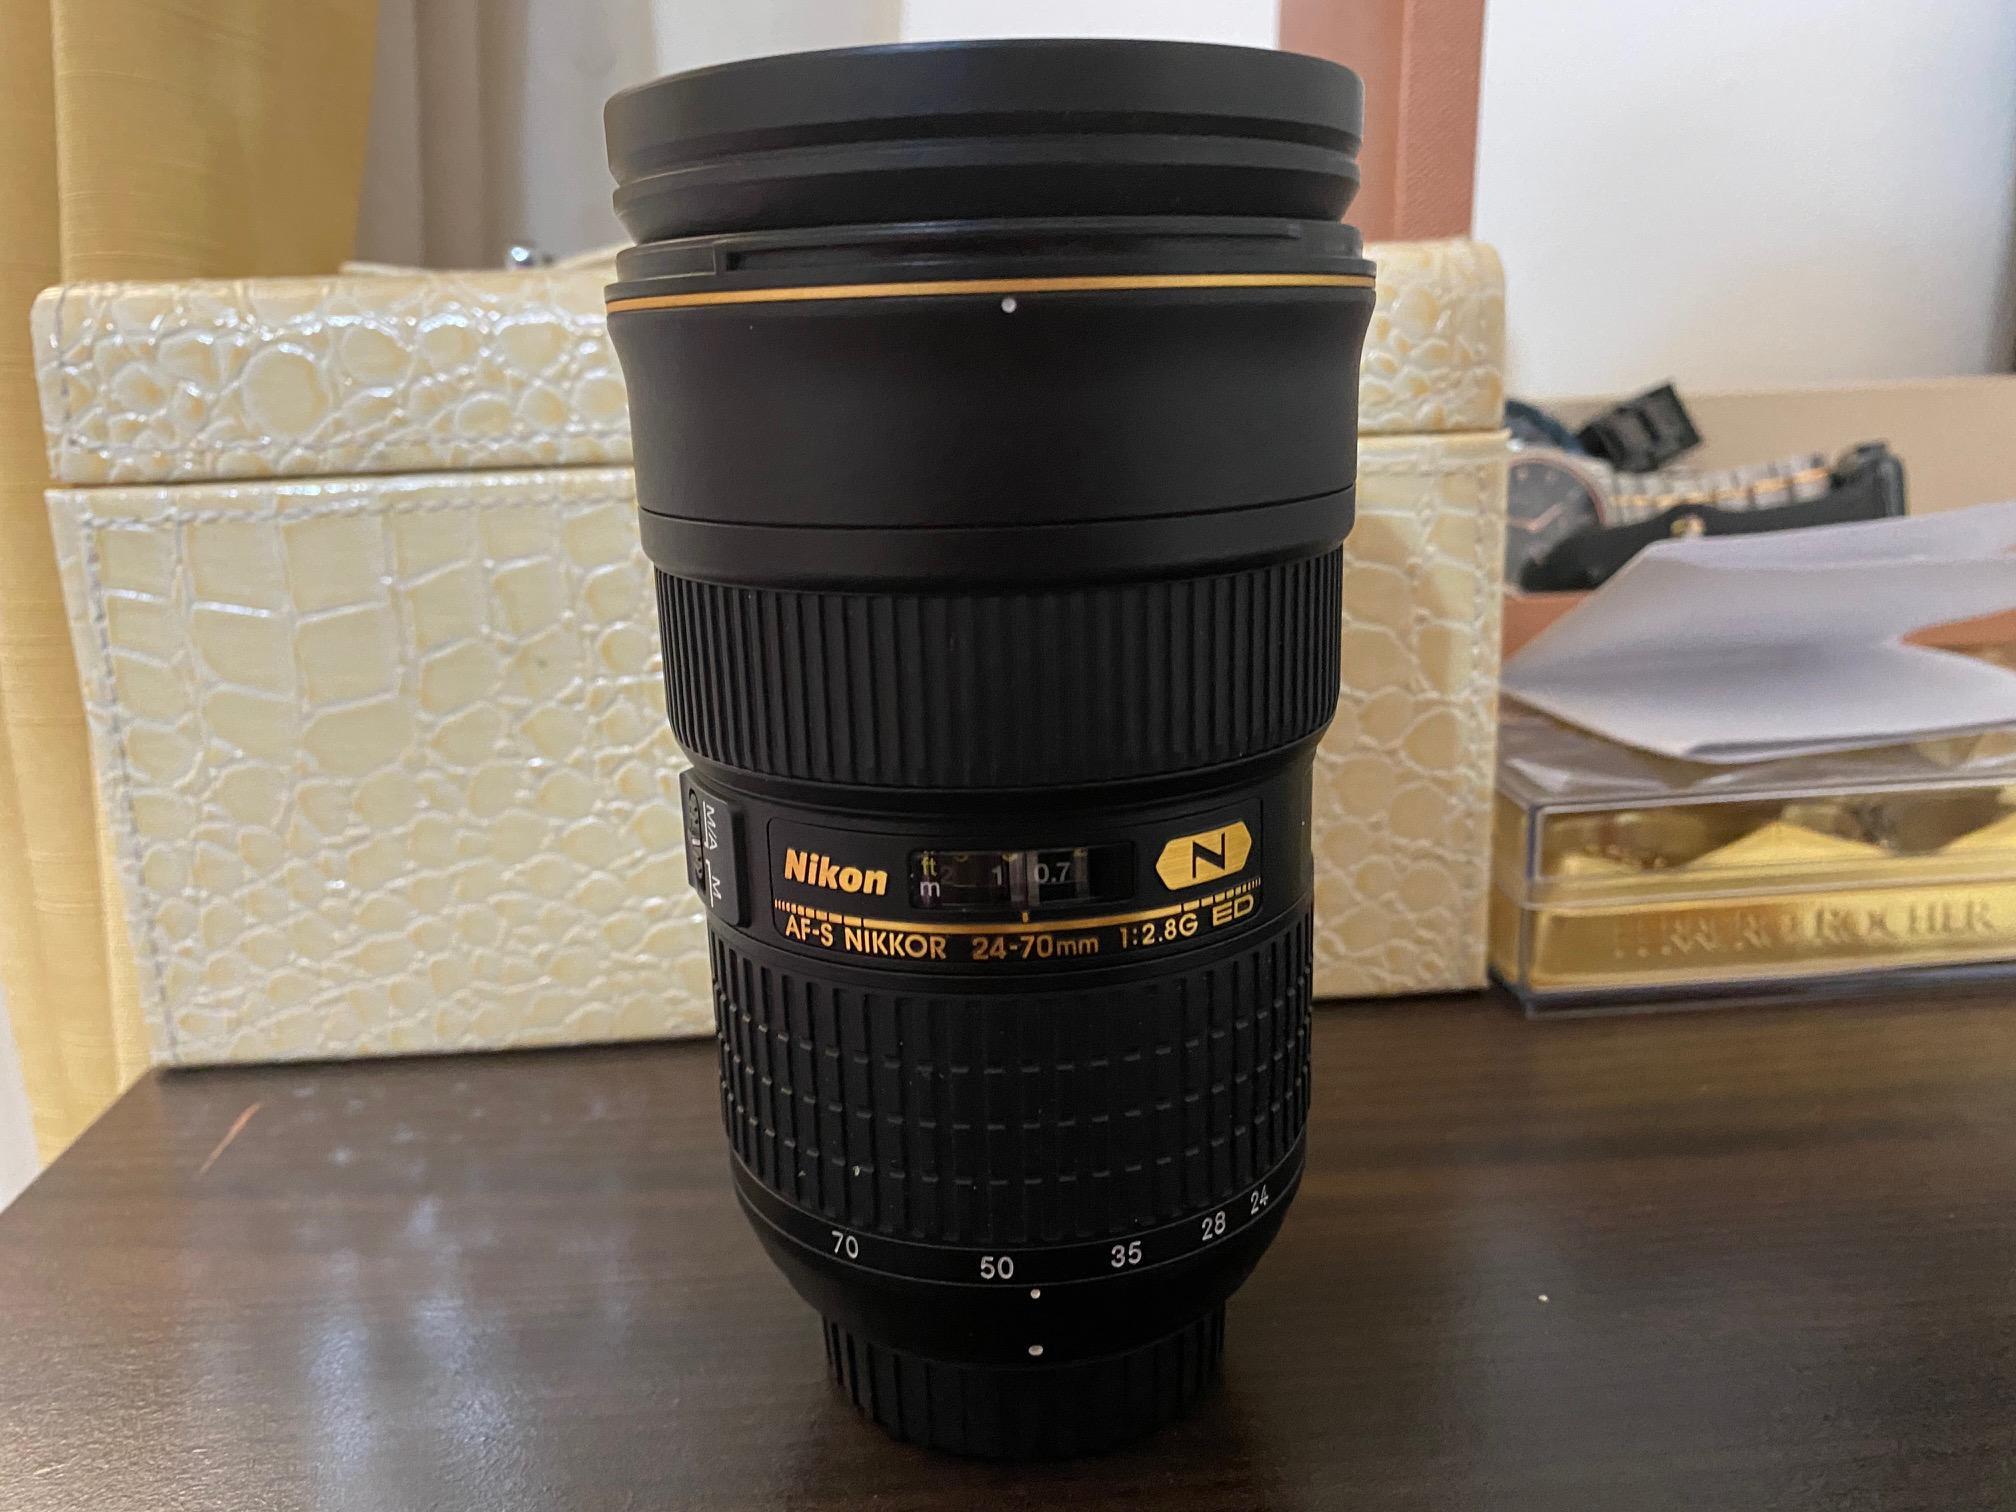 Nikon 24-70 F2.8G ED Lens for Sale